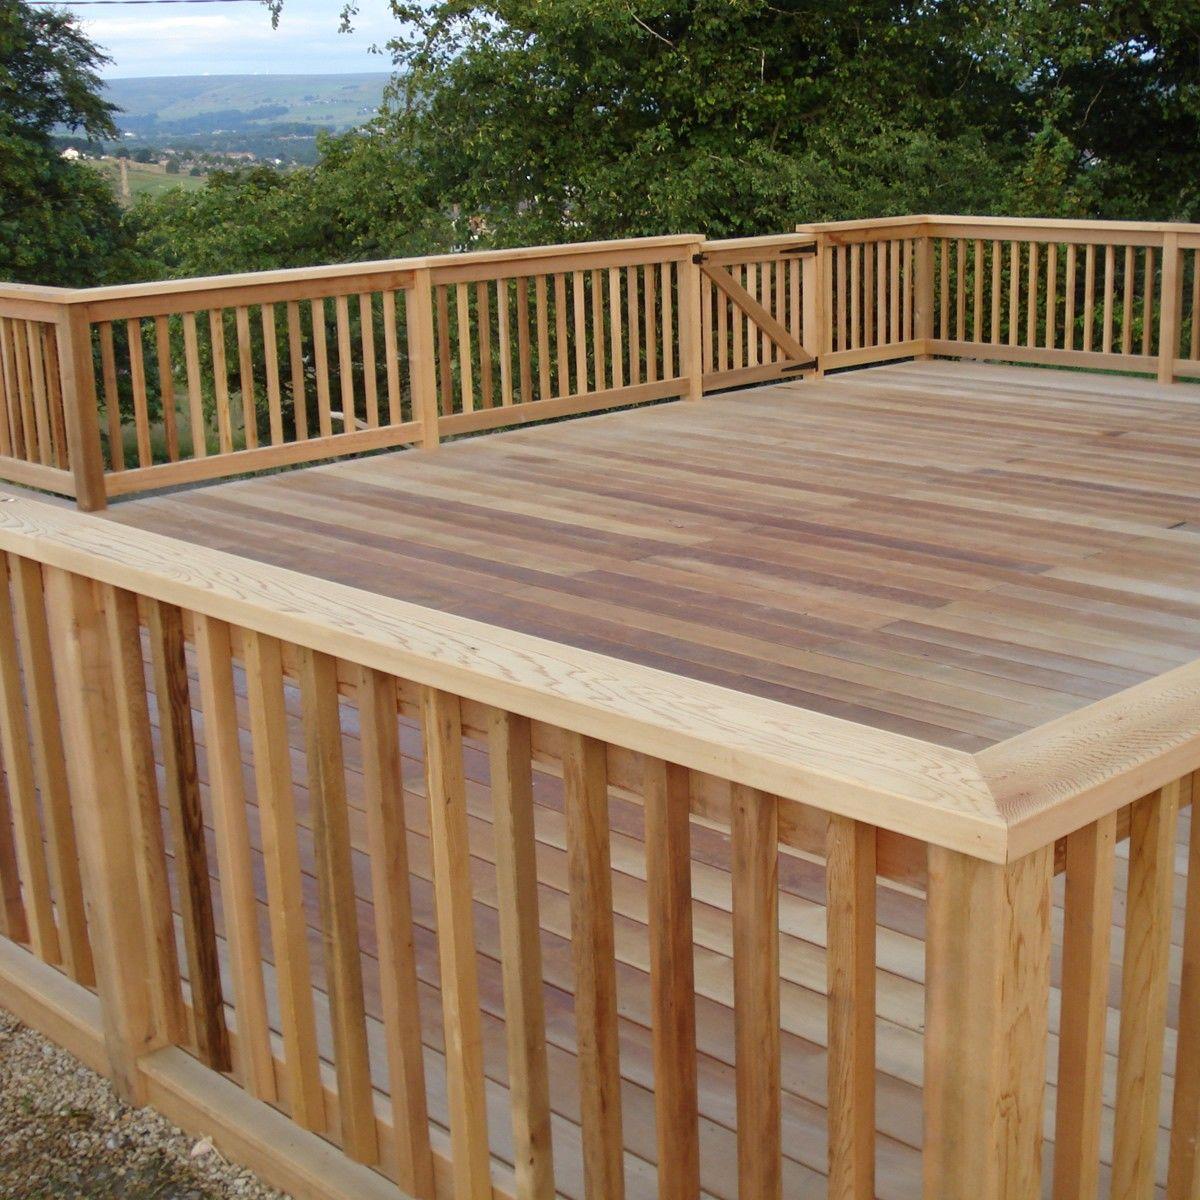 Wood deck railing ideas - When it comes to deck handrails ...